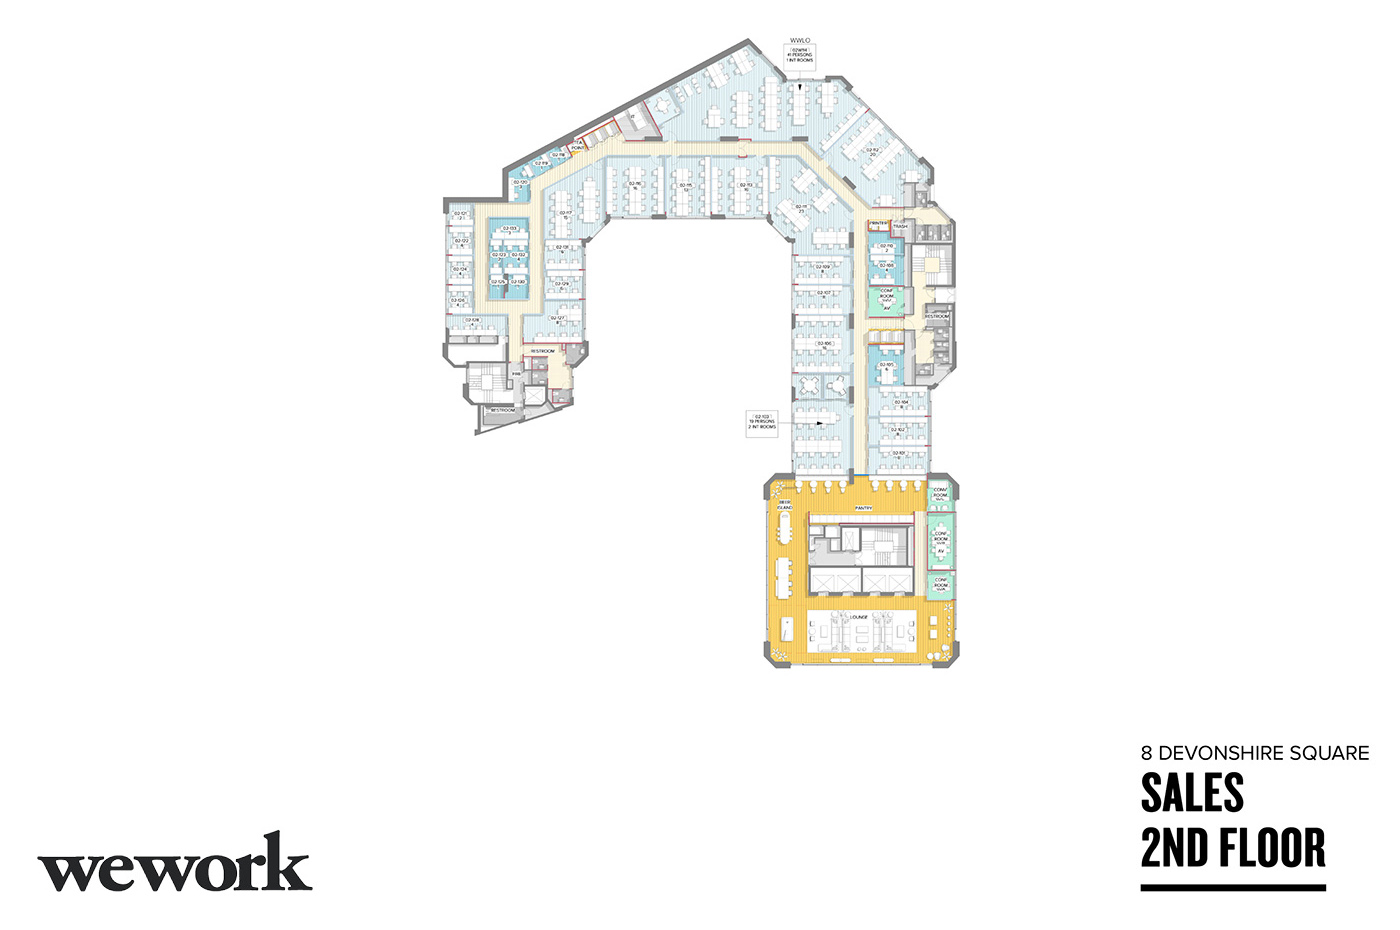 floorplans-3 copy.jpg